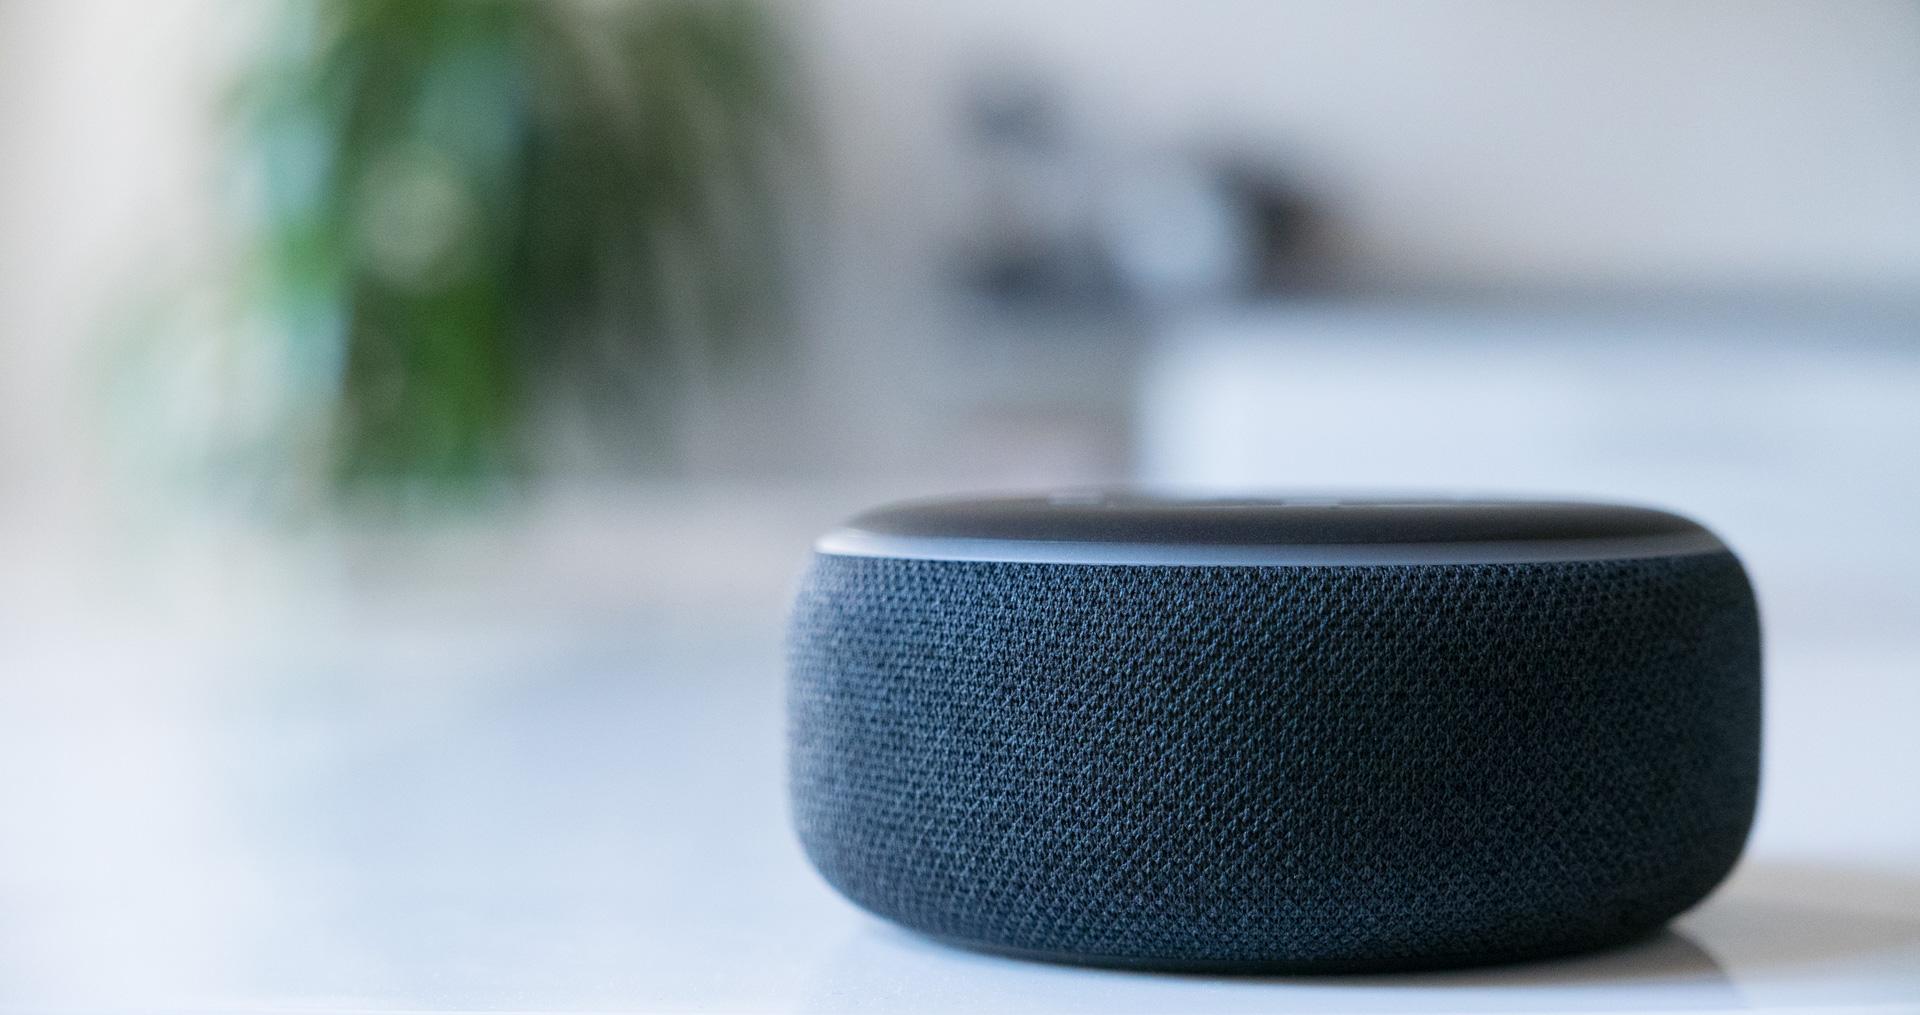 gravis der neue echo dot der 3 generation. Black Bedroom Furniture Sets. Home Design Ideas